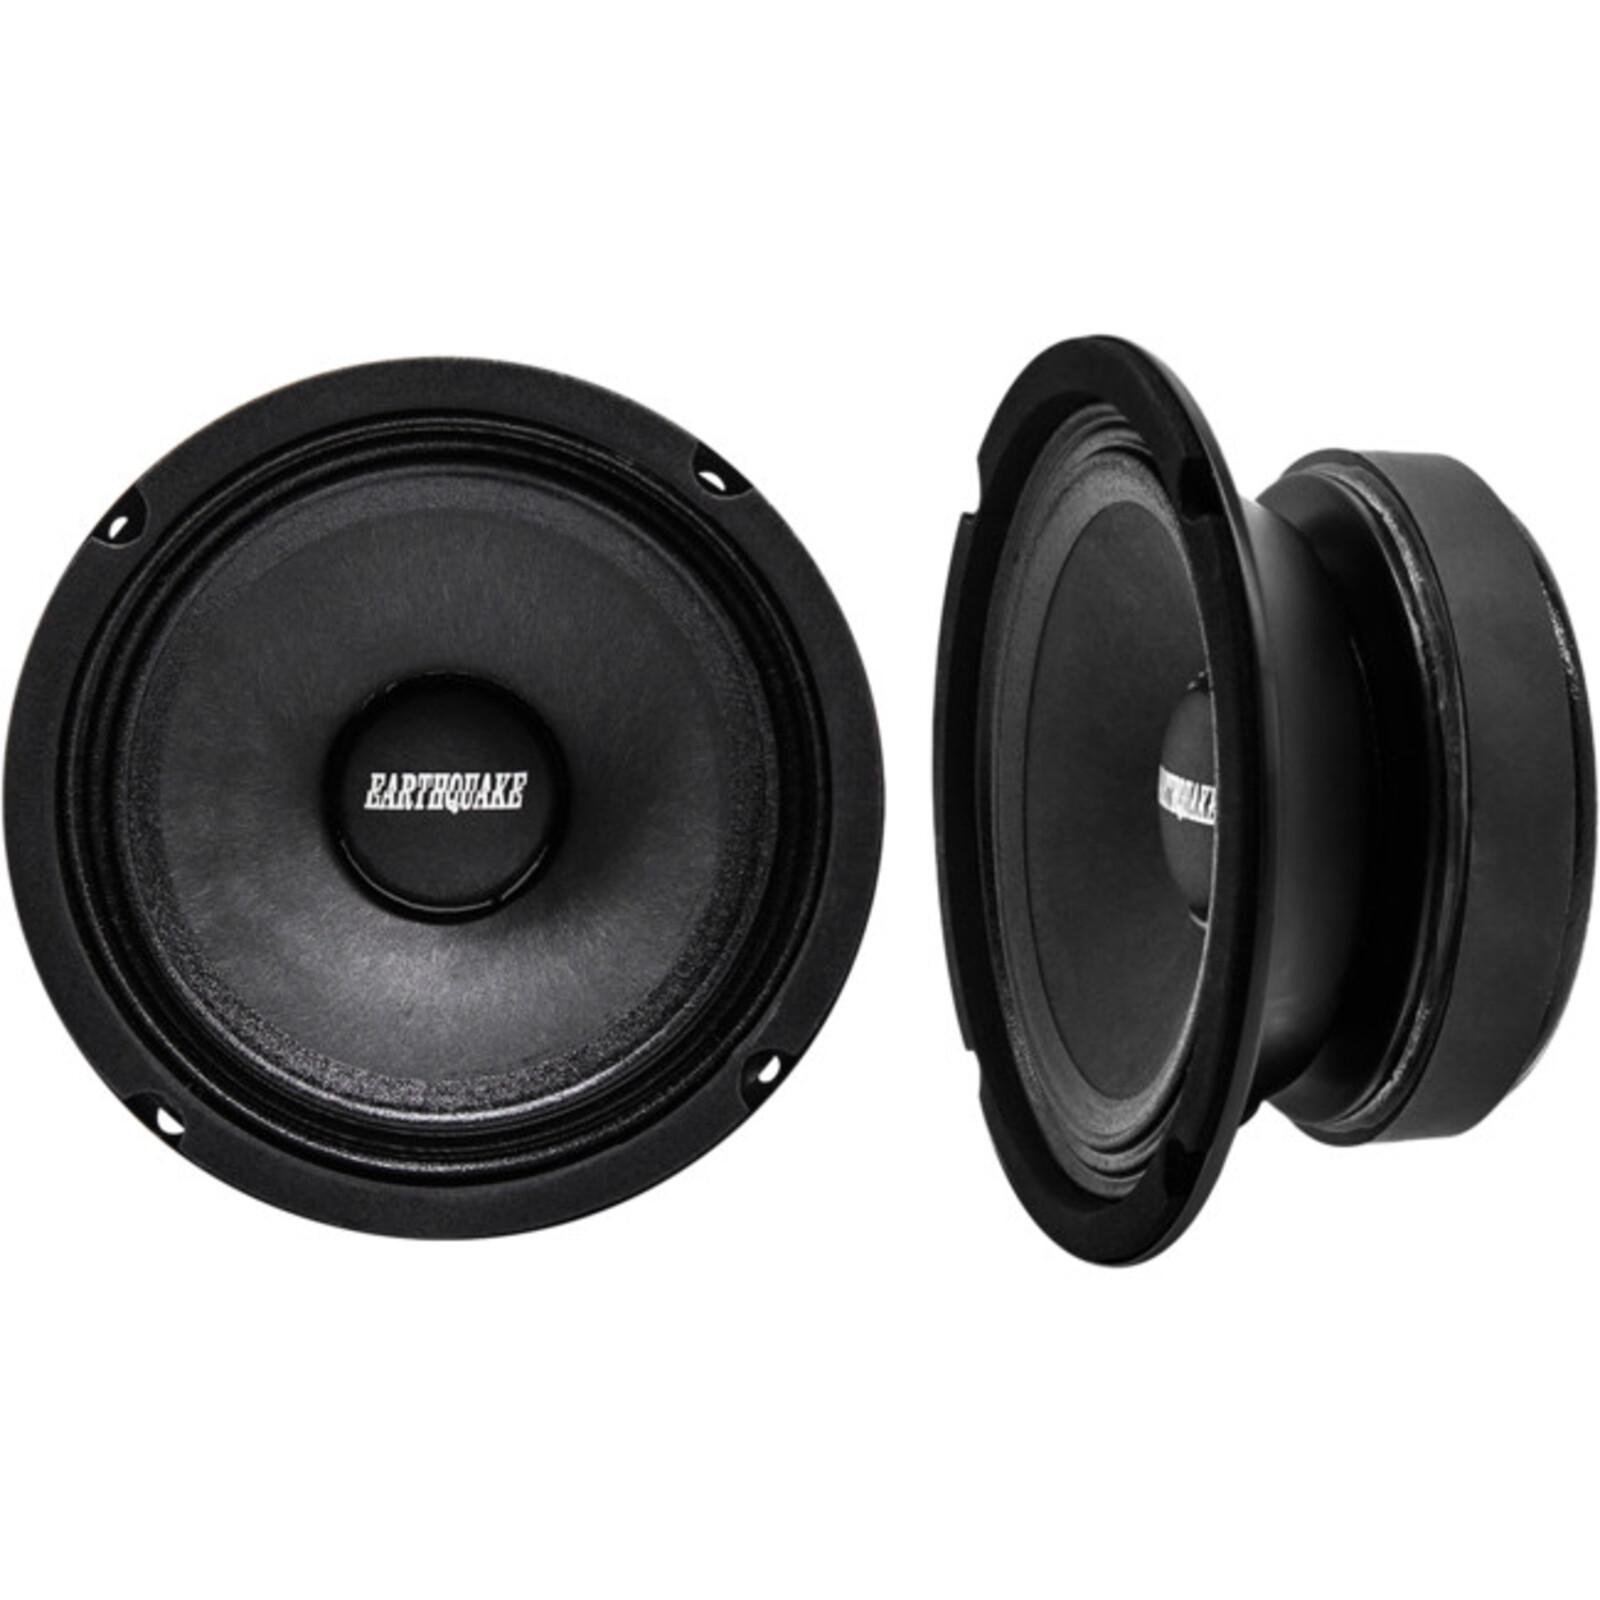 "Earthquake 5.25"" Cloth Speaker Eq5s8 150 Watts Max 5.25"" Cloth Speaker Eq5s8 Midbass 65W 8Ohm Sealed Basket 150 Watts Max Eq5-S8"